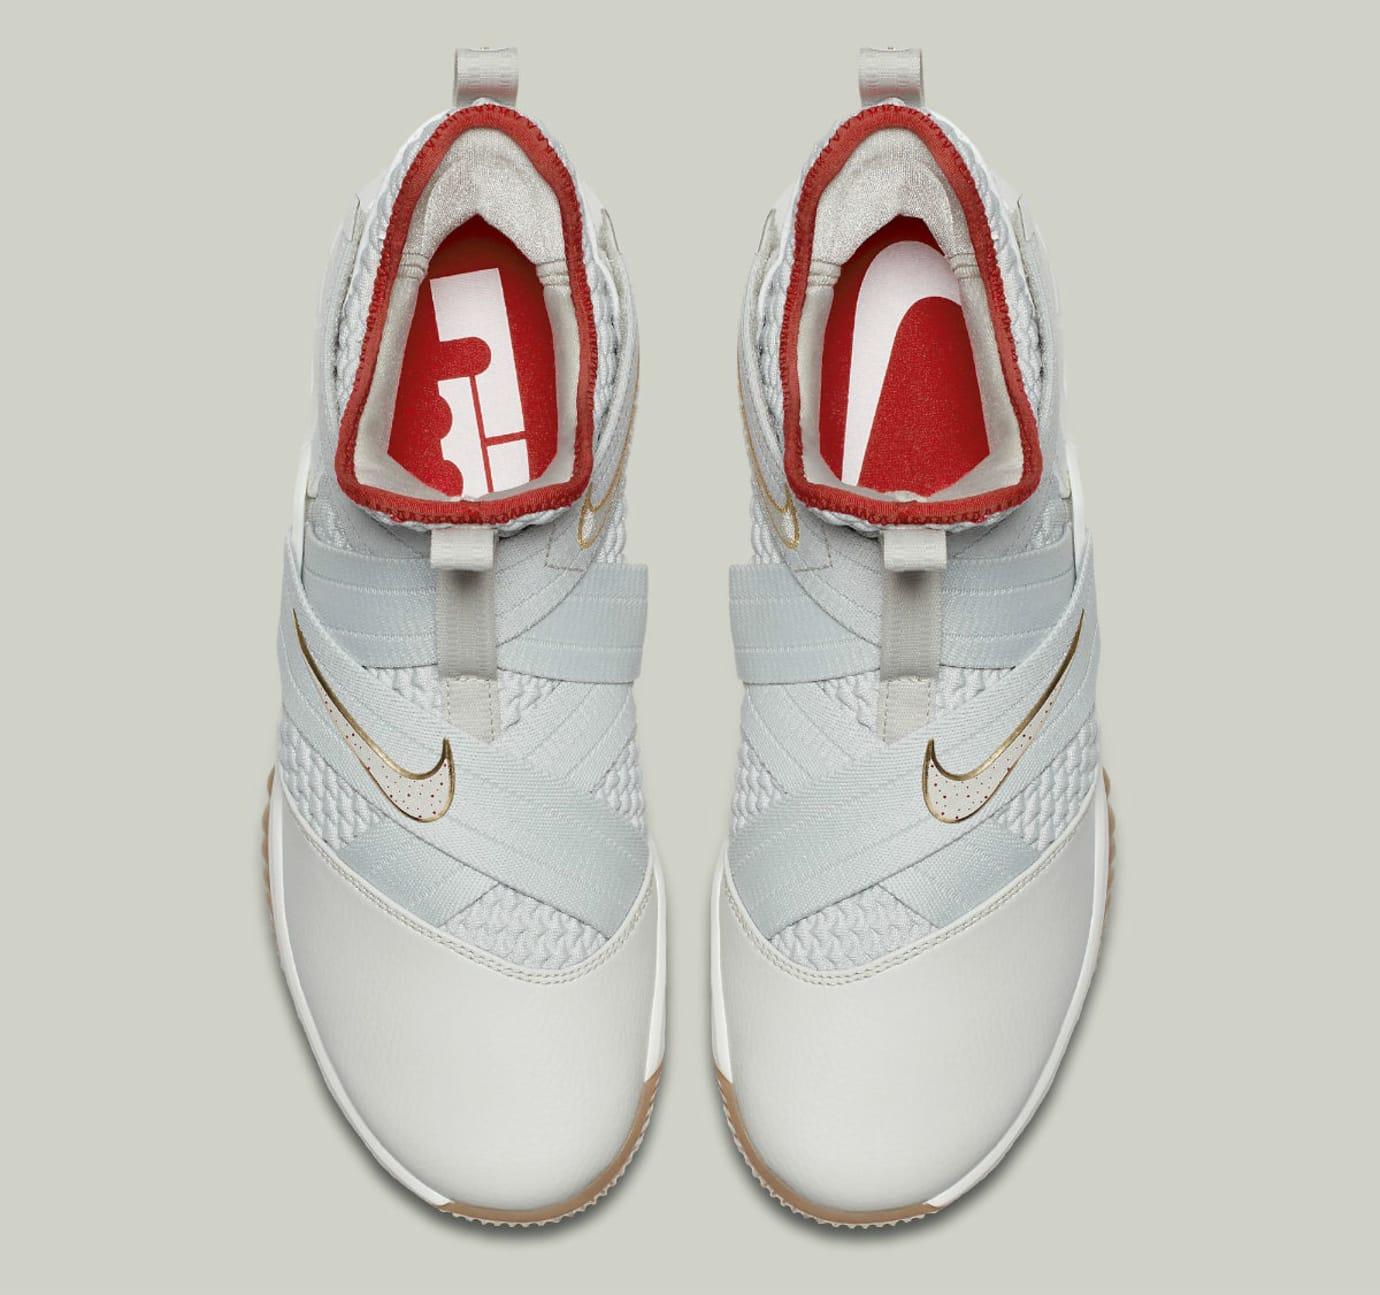 super popular 8f14a 0d5fd Nike LeBron Soldier 12 Yeezy Release Date AO2609-002 | Sole ...